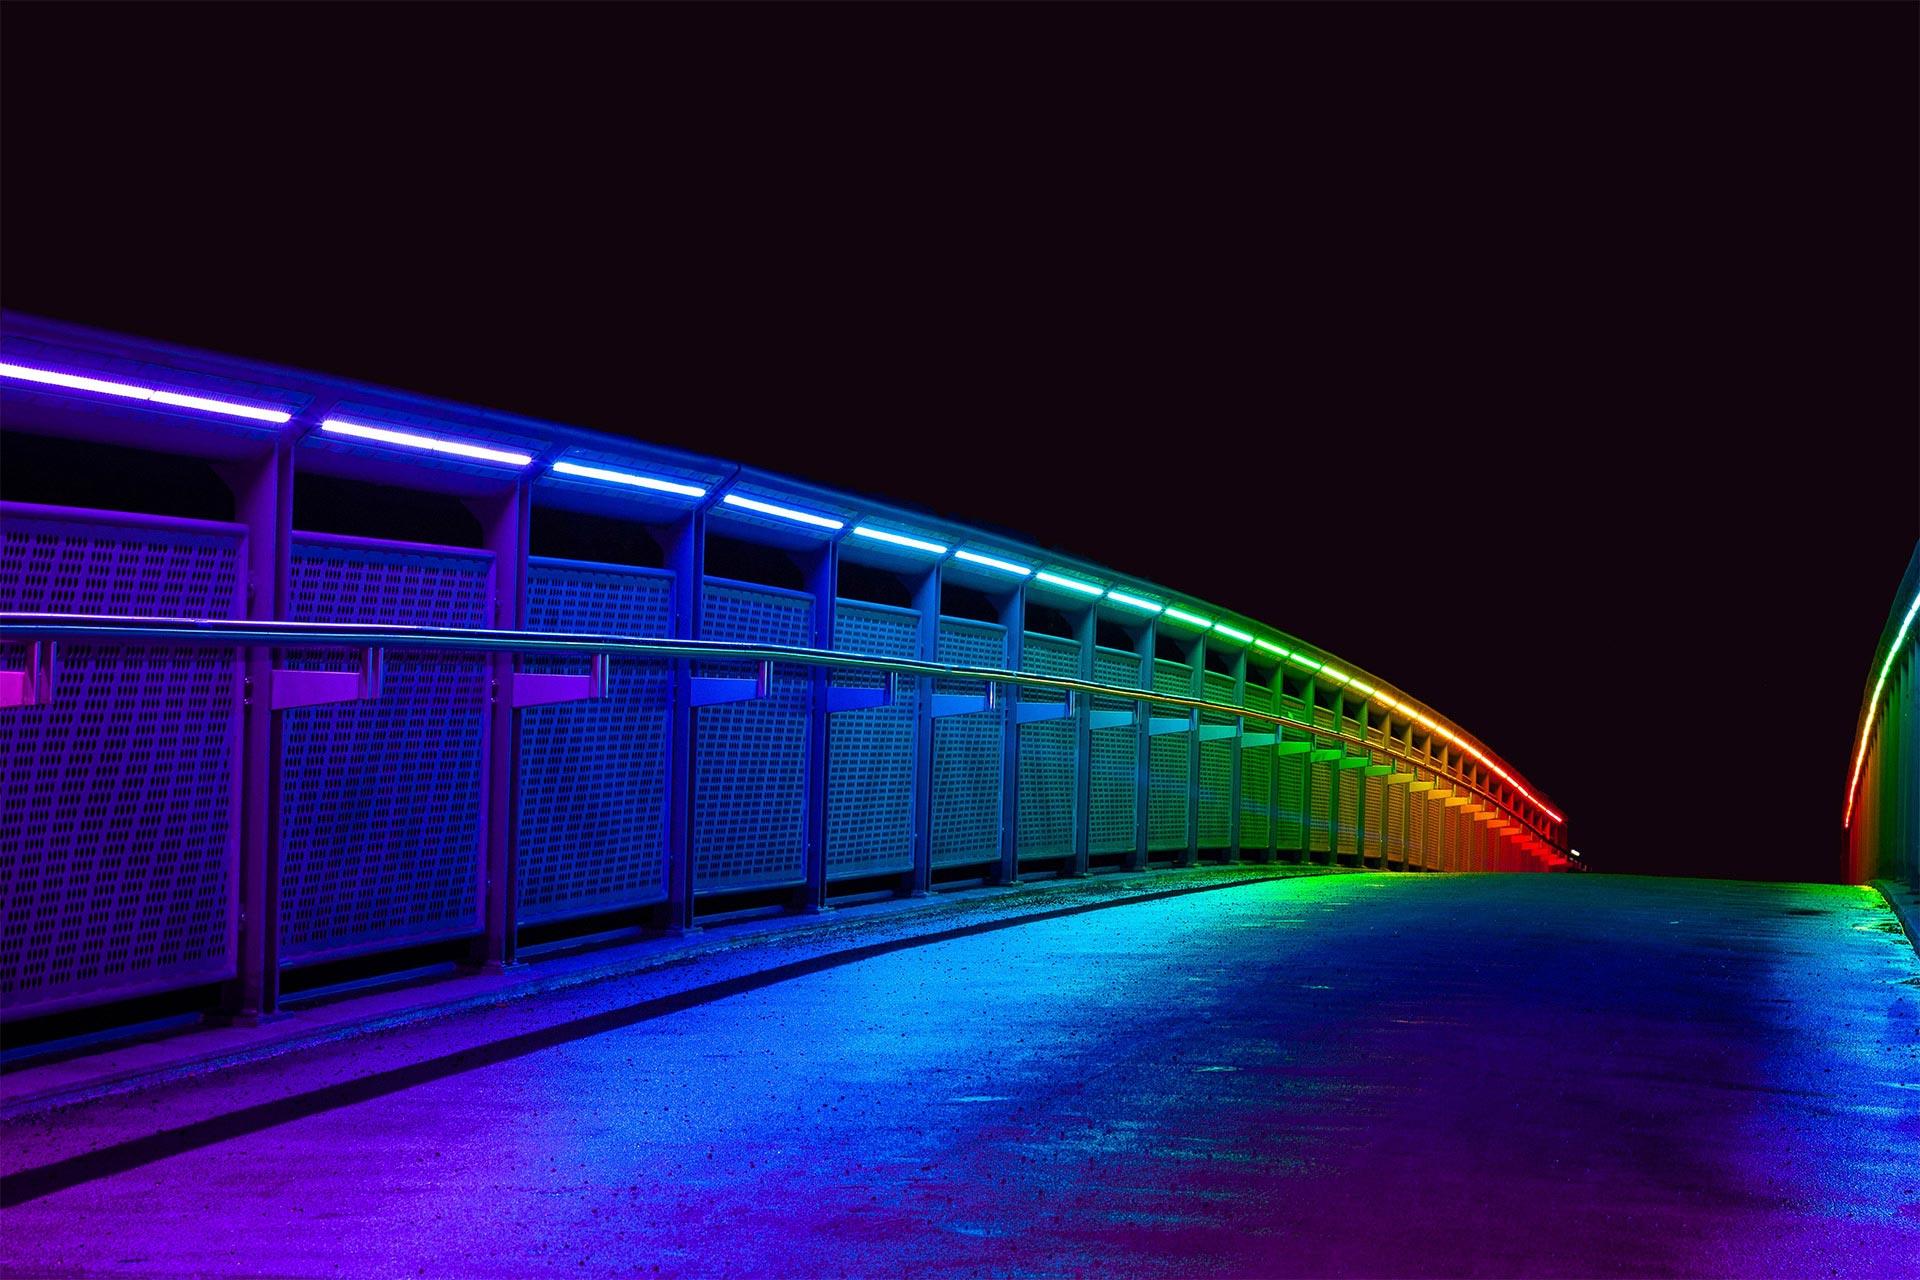 Led Licht Strip : Best alternatives to philips hue light strips in imore